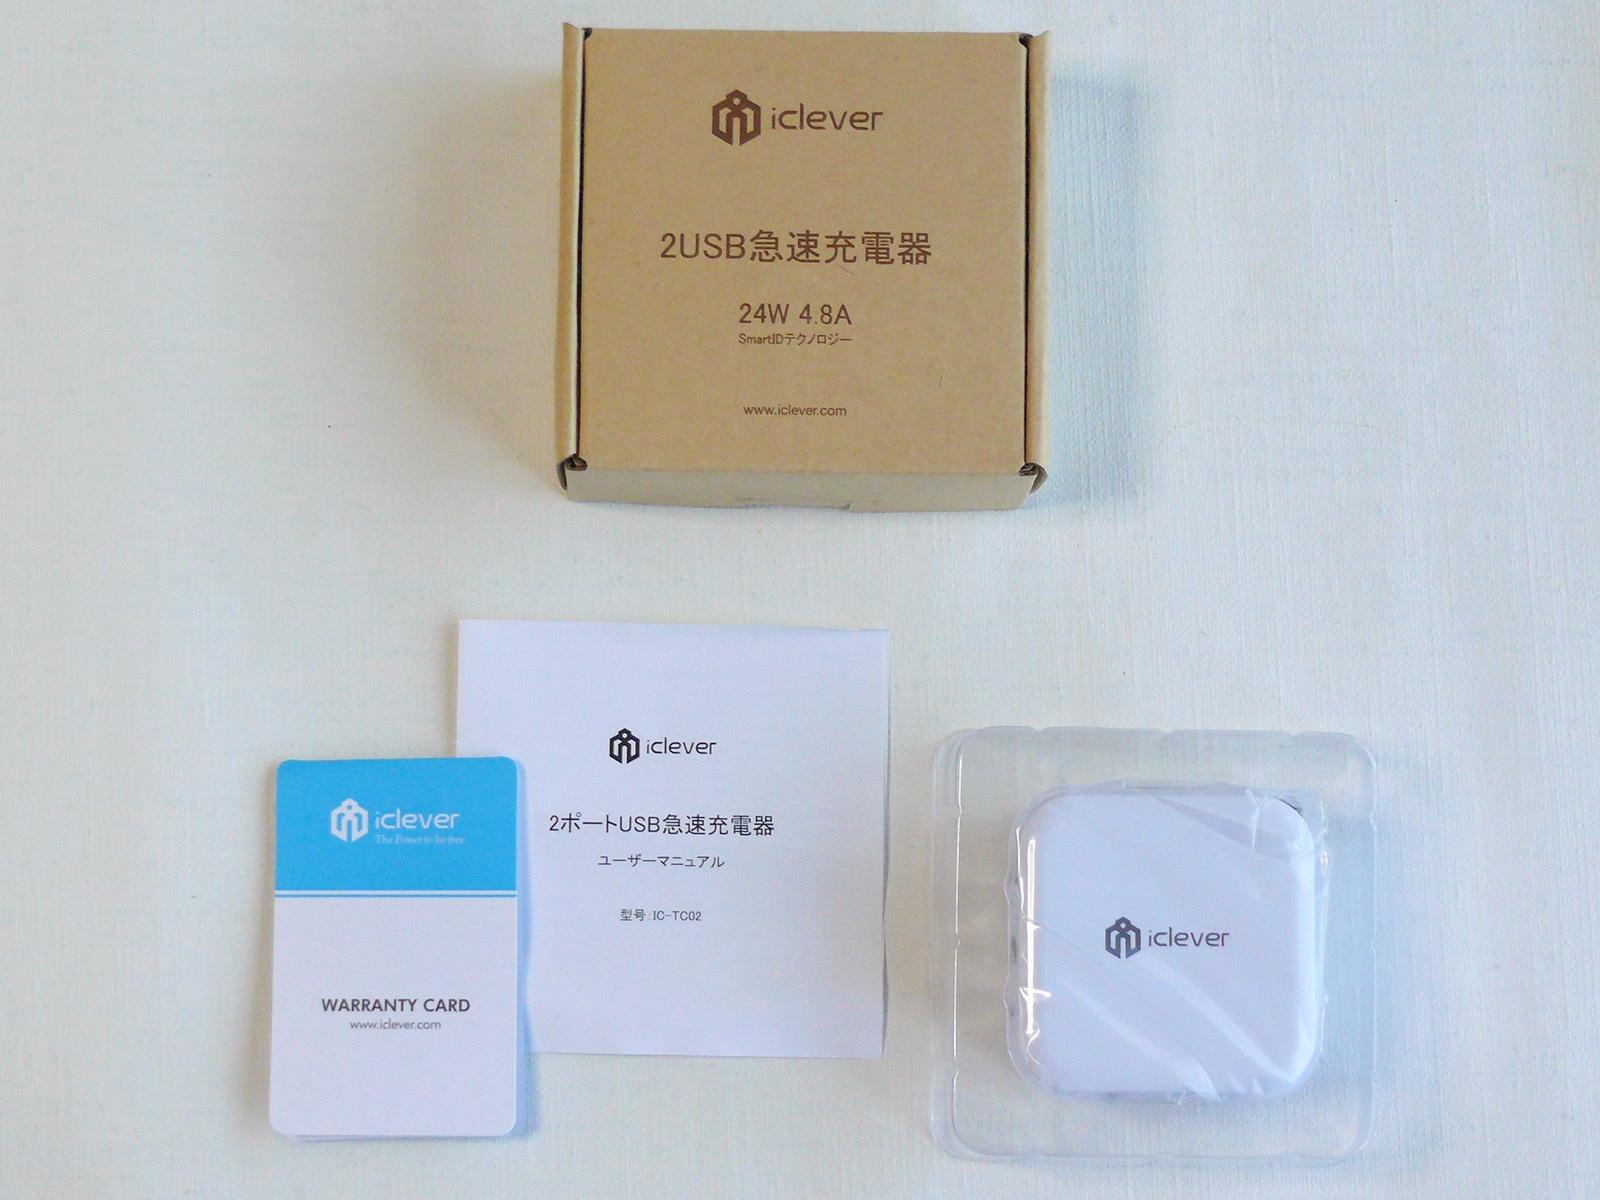 iClever USB充電器 開封 同梱品